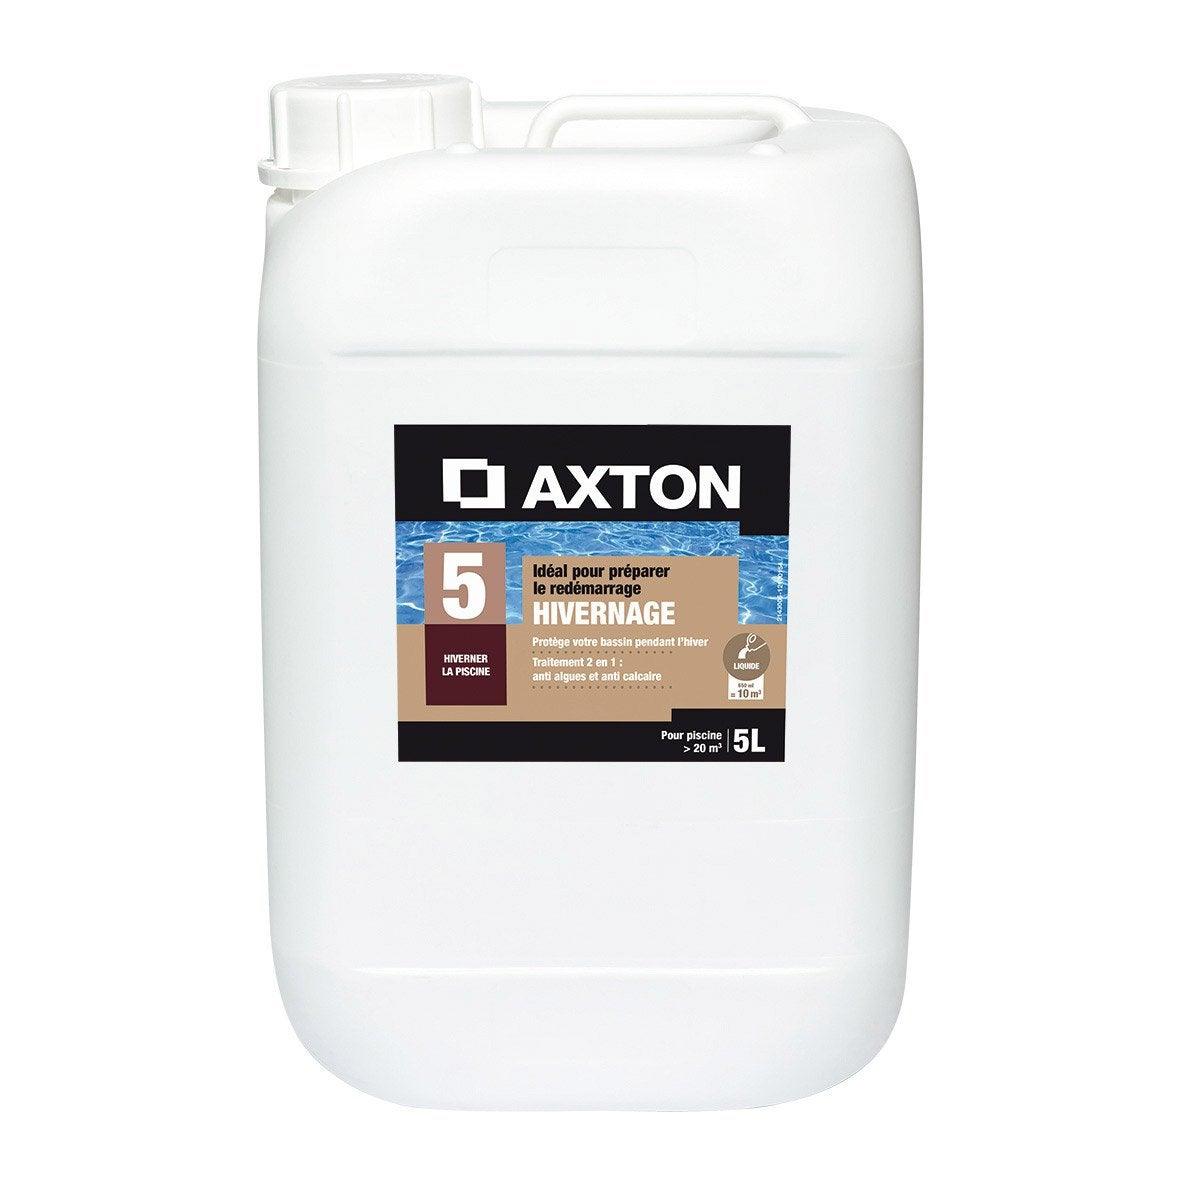 Hivernage piscine axton liquide 5 l 5 kg leroy merlin for Produit piscine